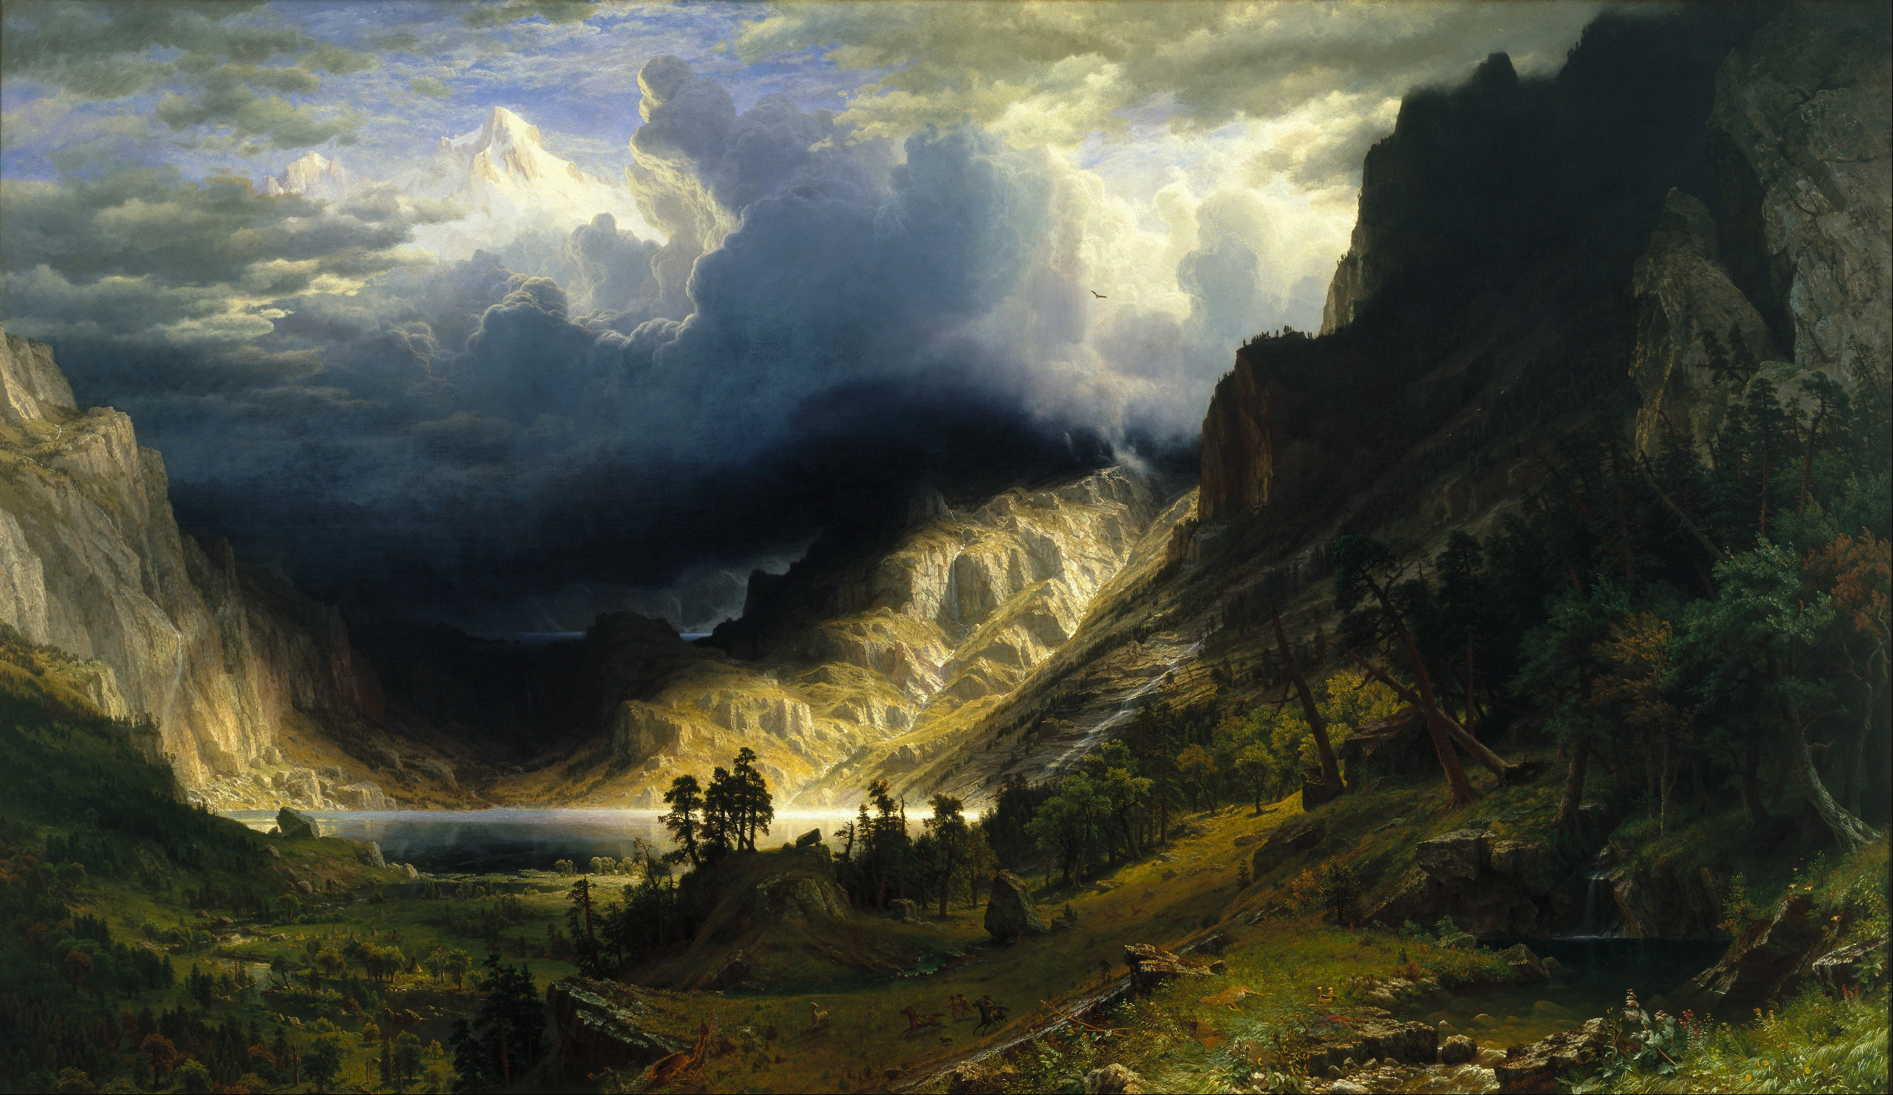 A Storm in the Rocky Mountains - Albert Bierstadt - 1868